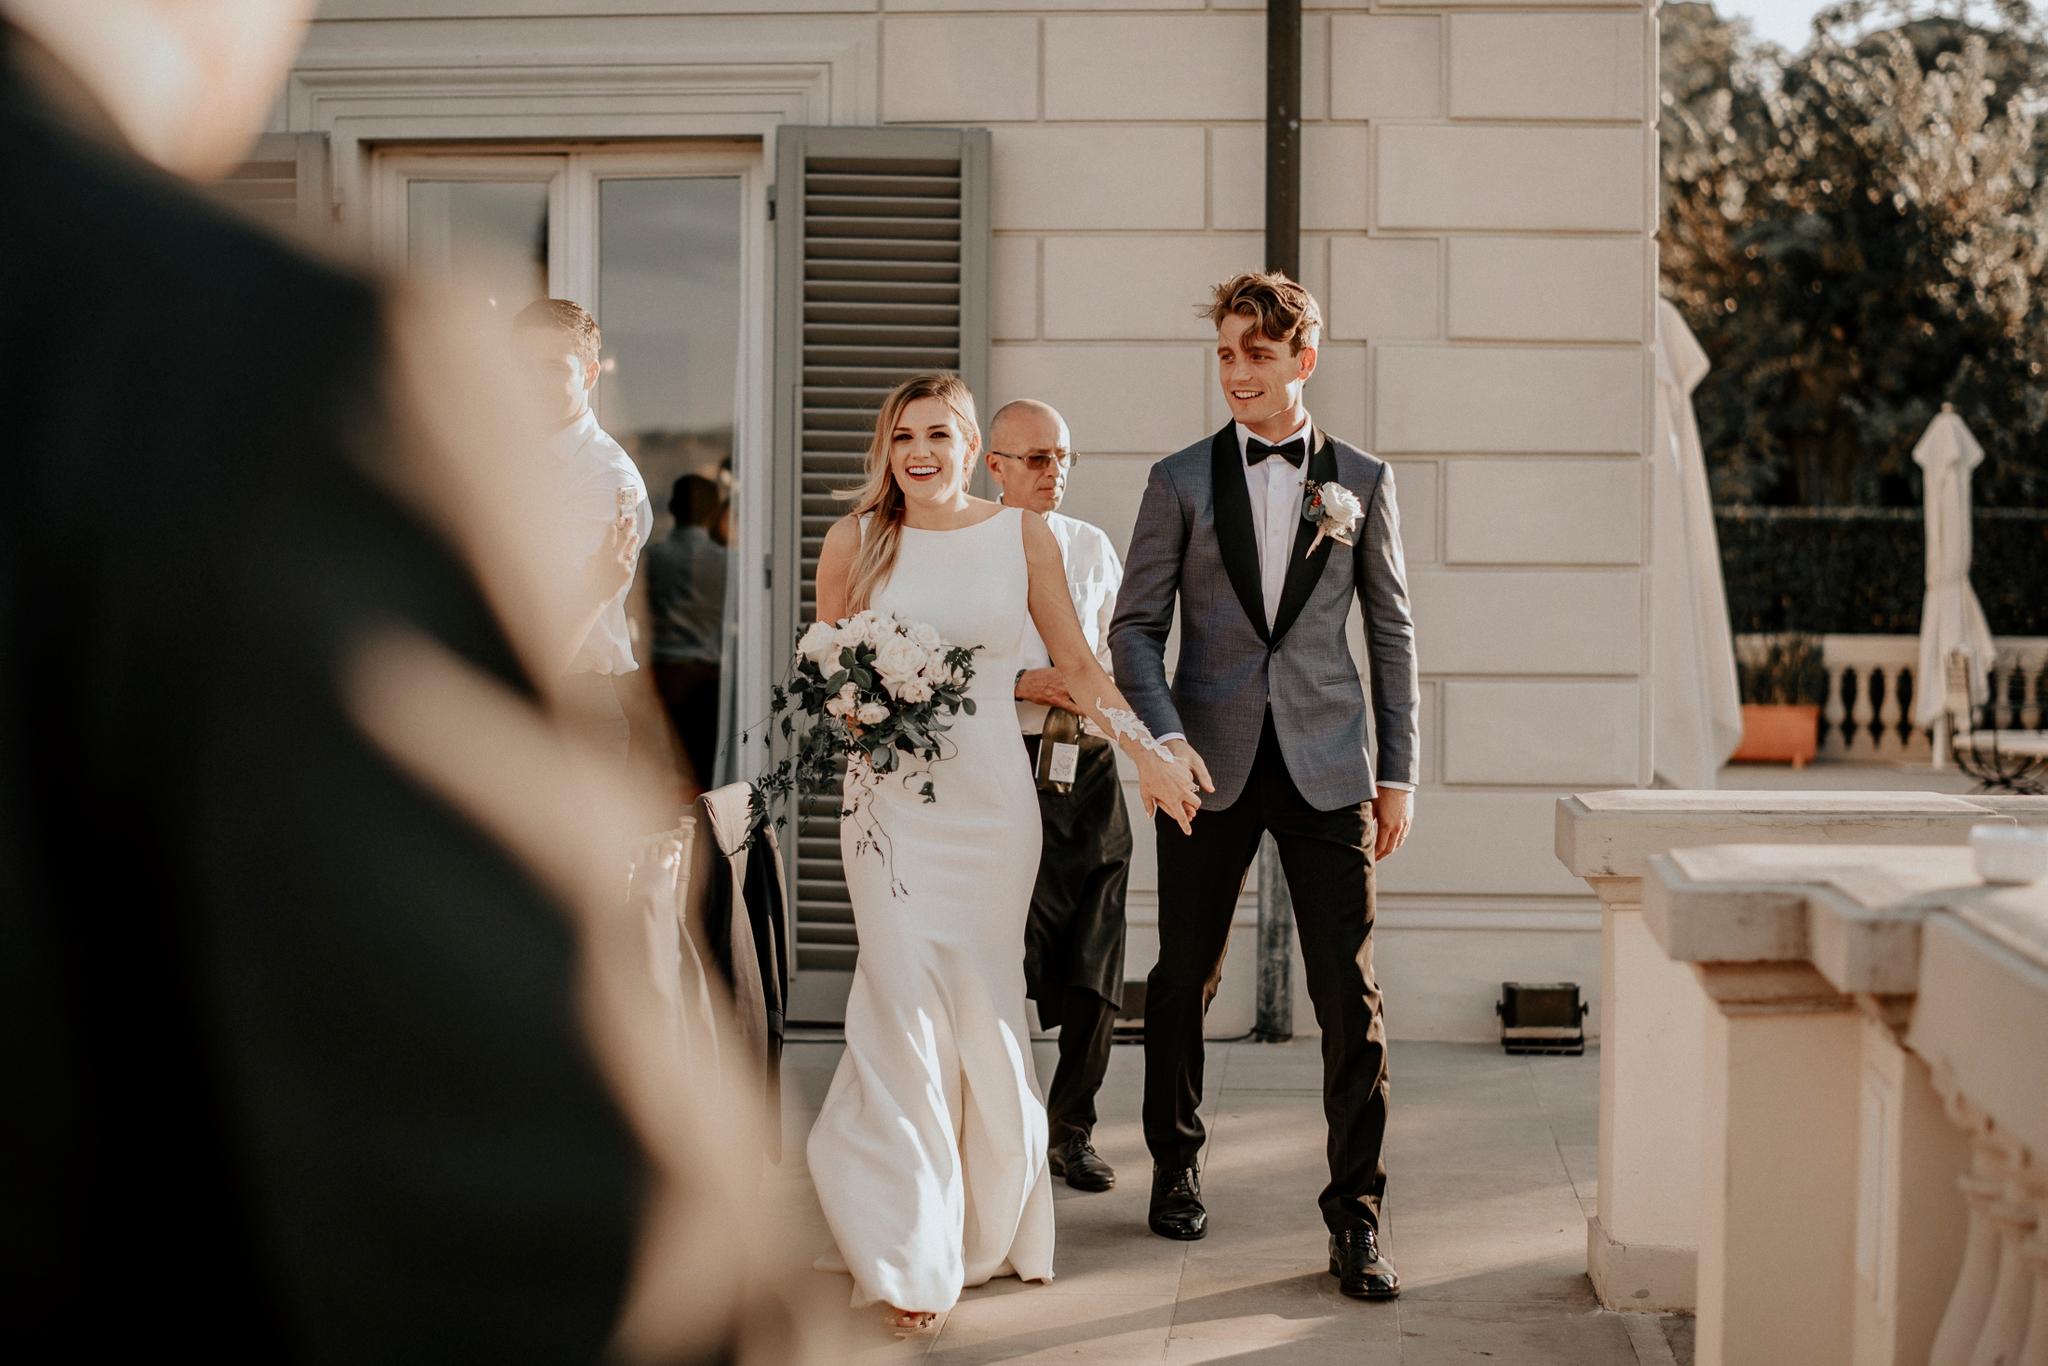 destination-austin-wedding-photographer-italy-florence531.JPG